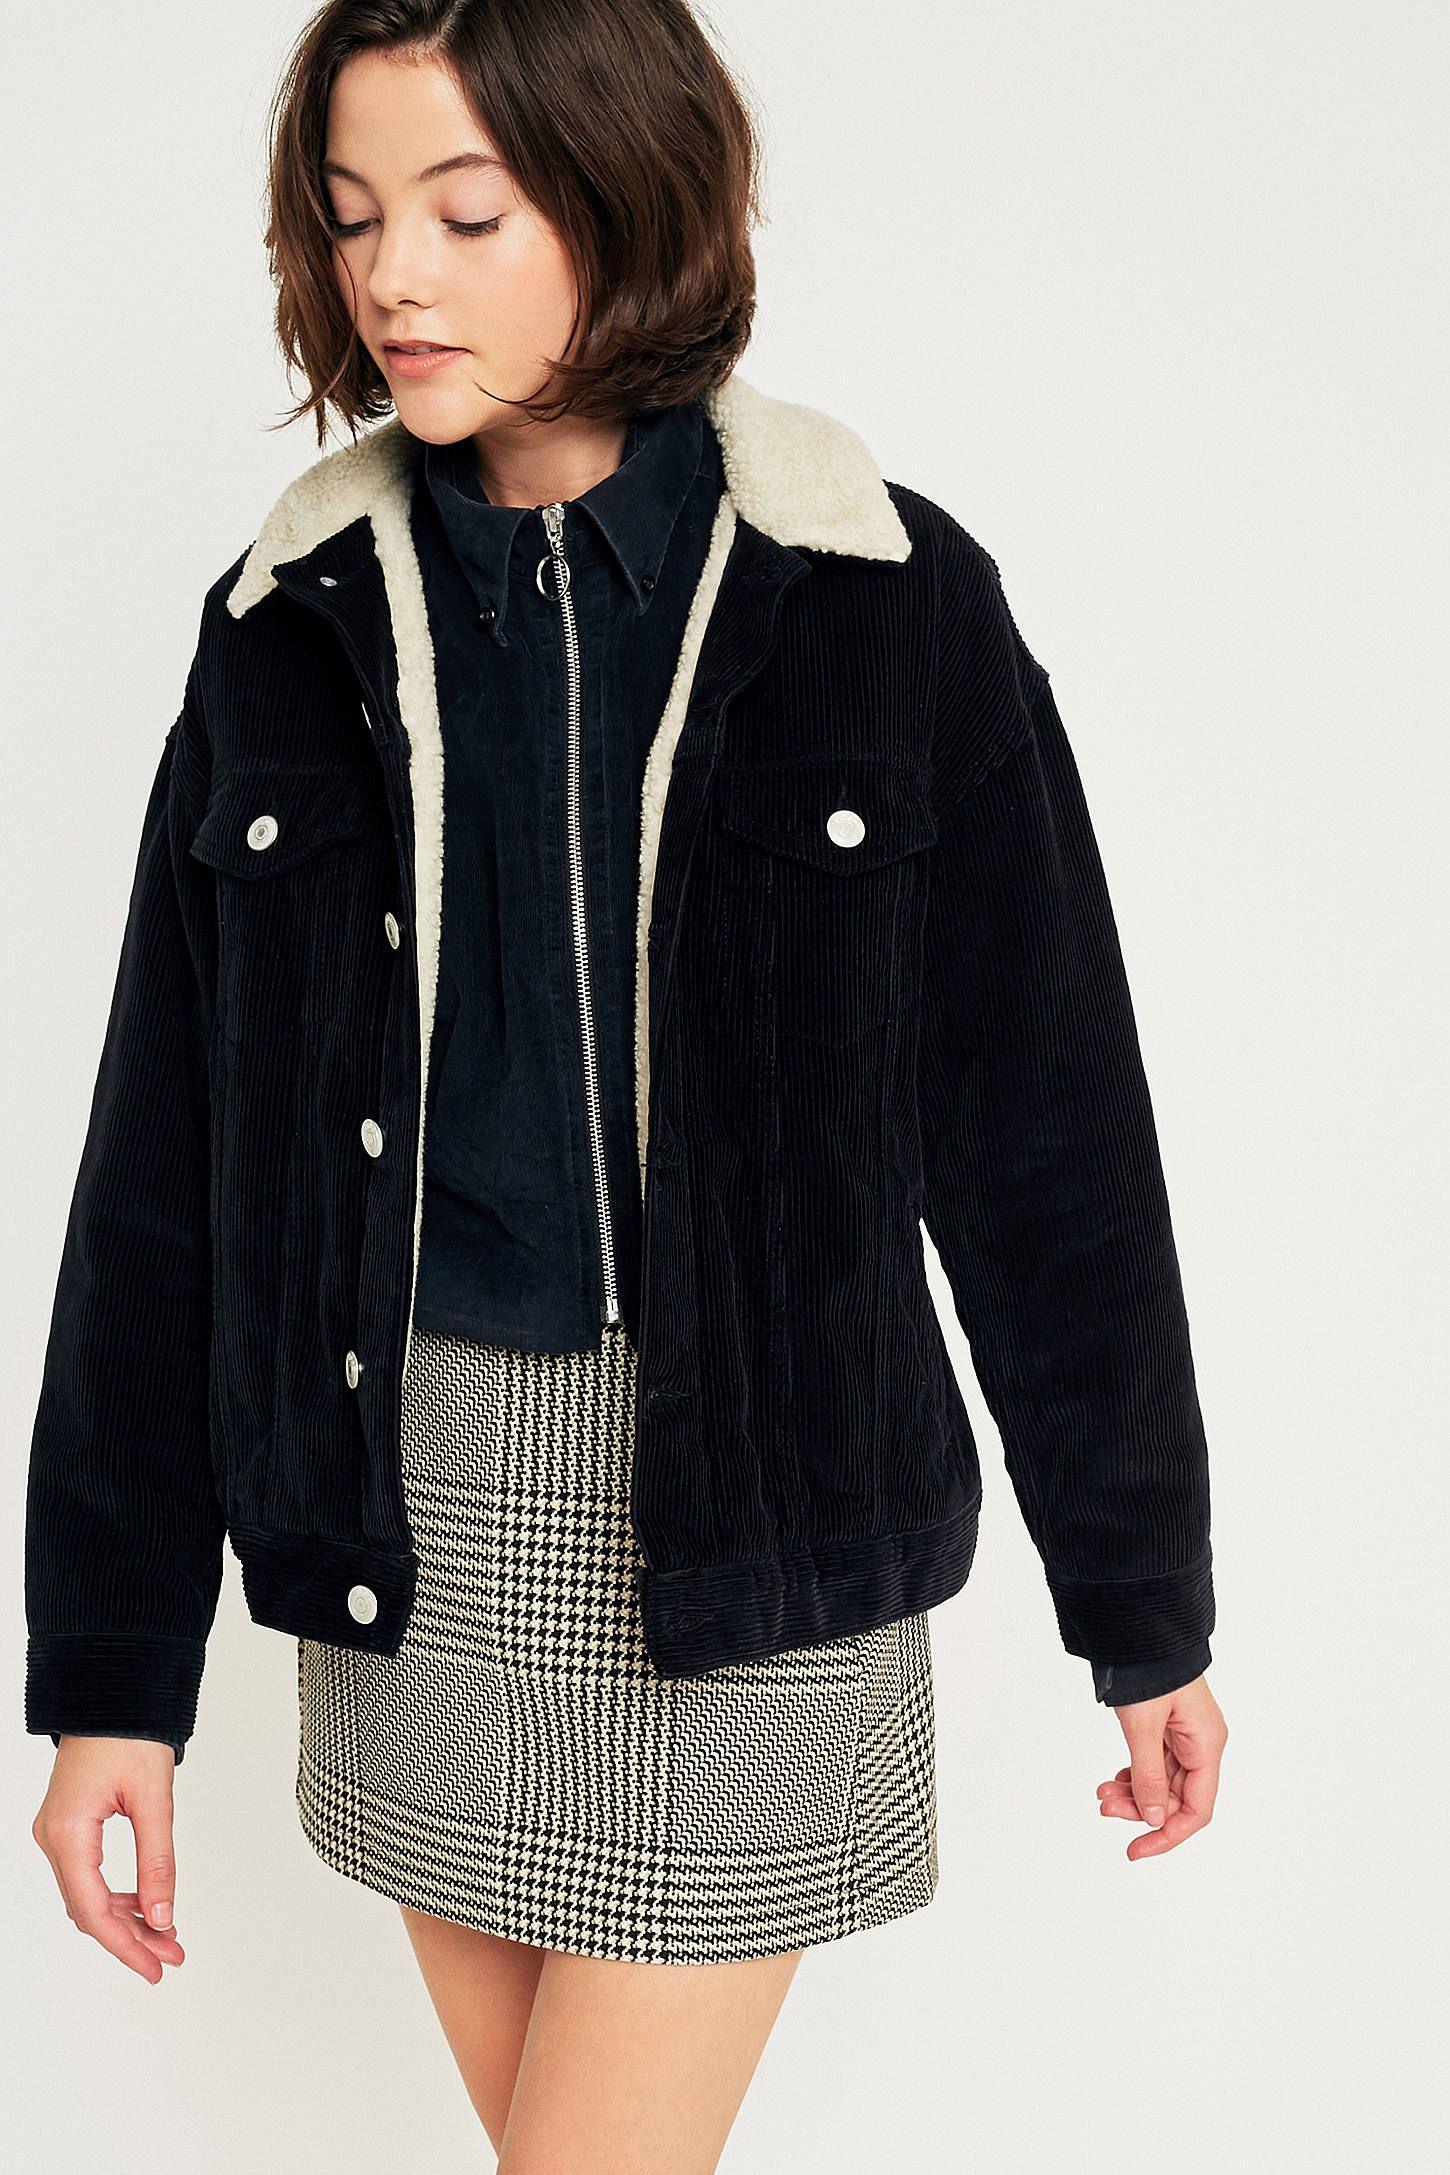 BDG Western Borg Lined Black Corduroy Jacket | Jacket outfit